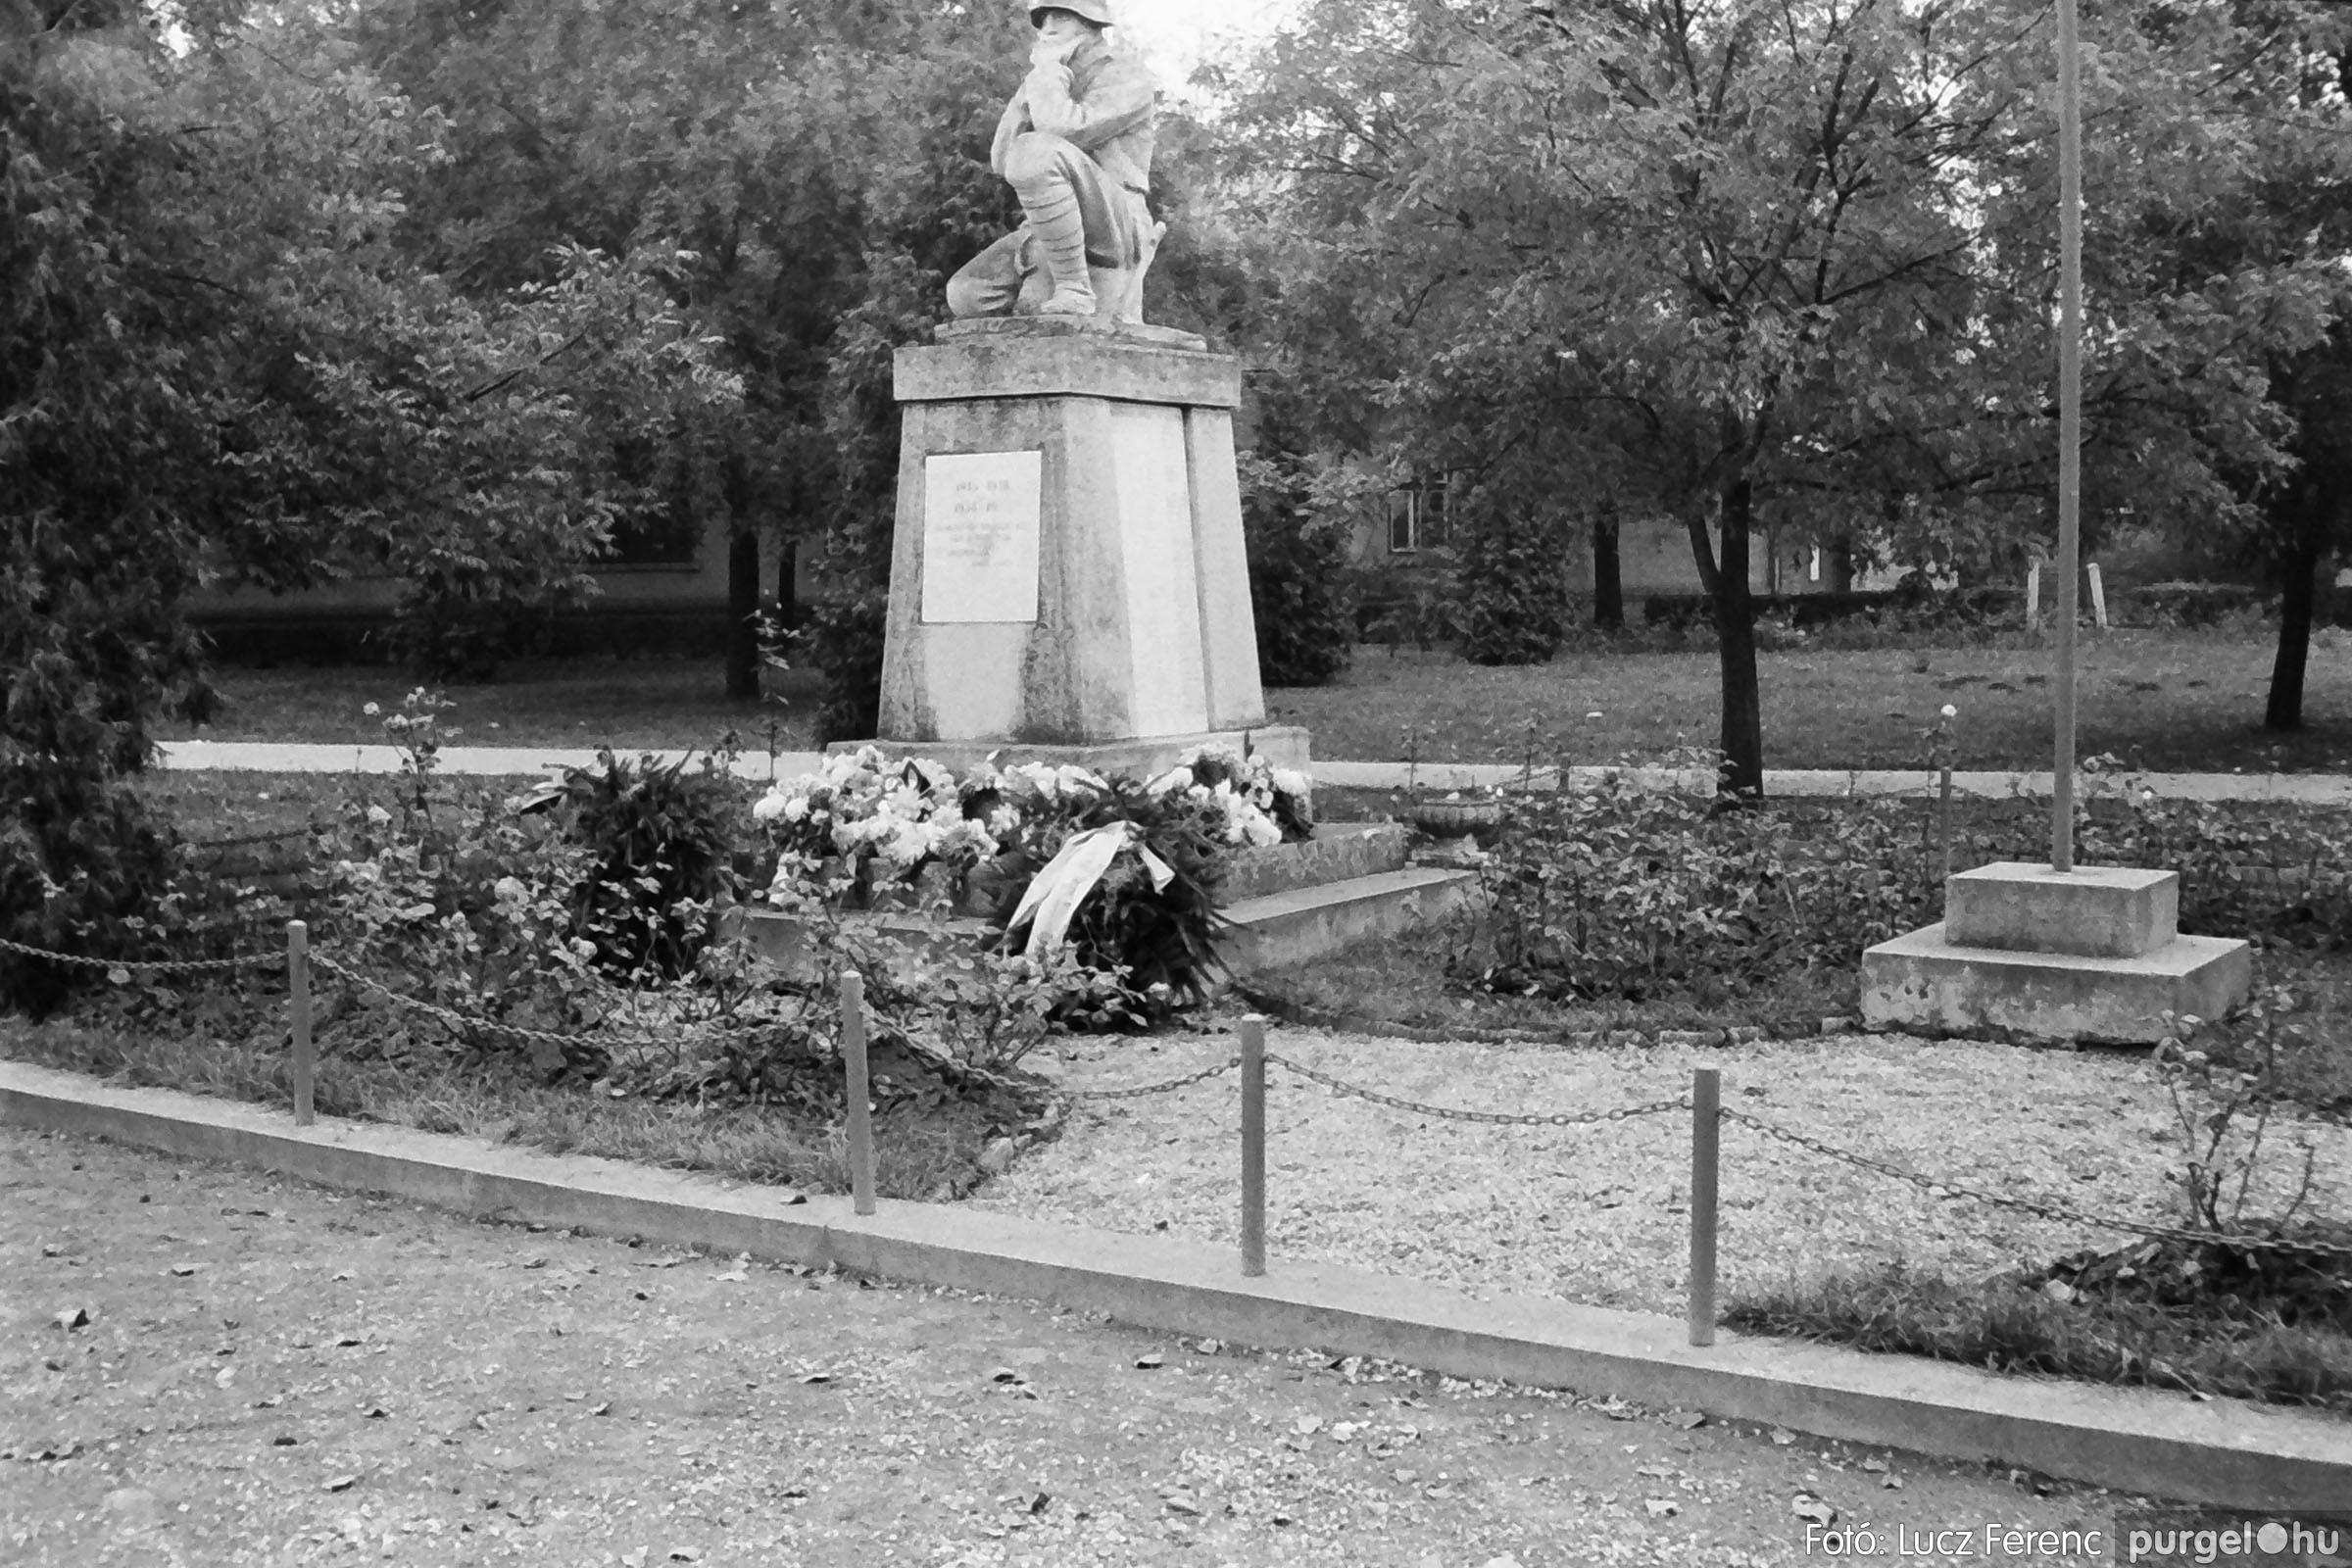 025 1975.10. Szovjet katonai emlékmű 006 - Fotó: Lucz Ferenc IMG00235q.jpg